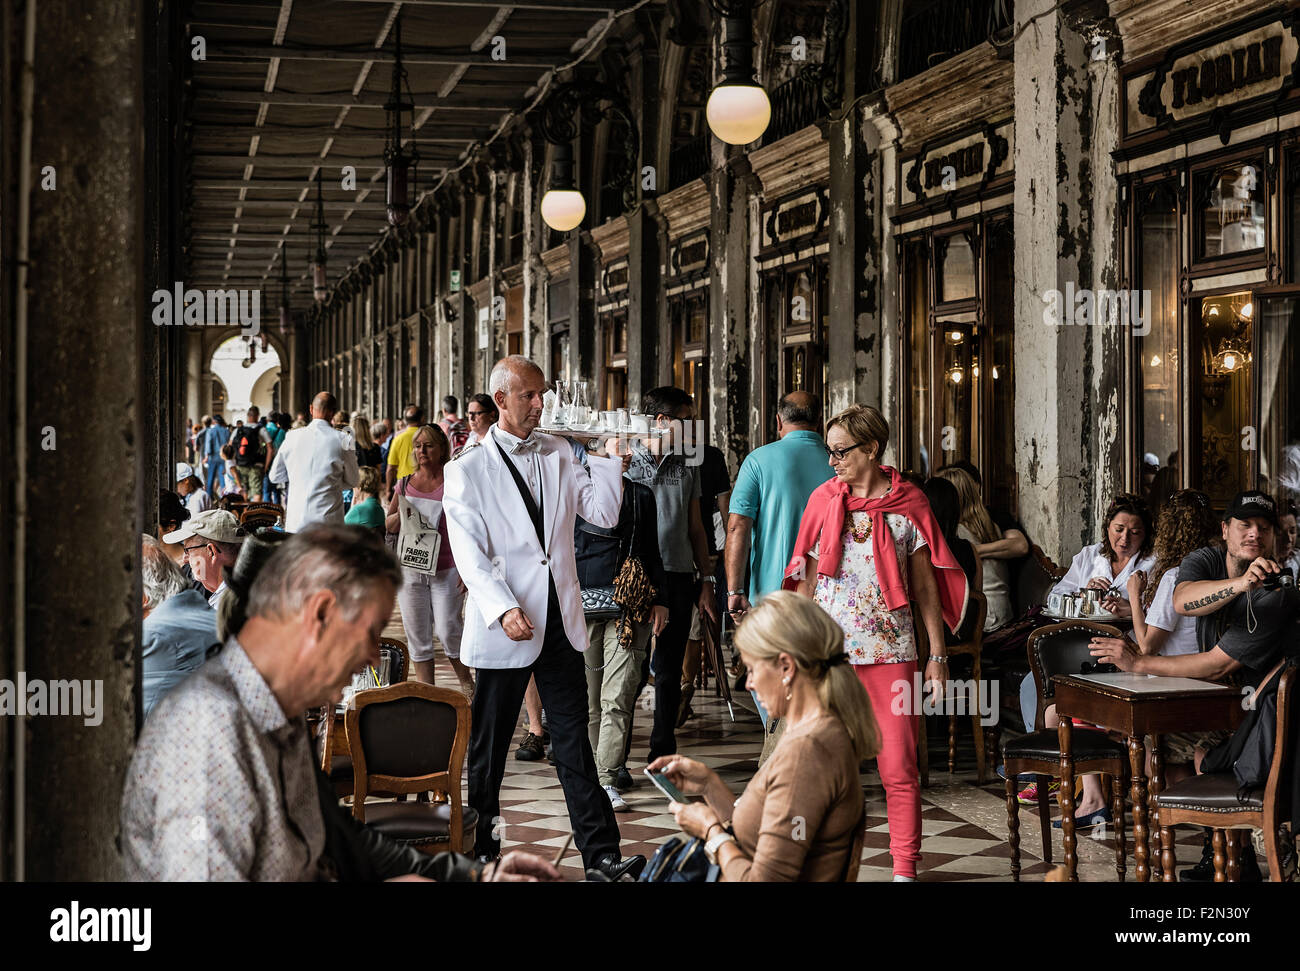 Florian Cafe, La Plaza de San Marcos, San Marco, Venecia, Italia, Europa Imagen De Stock